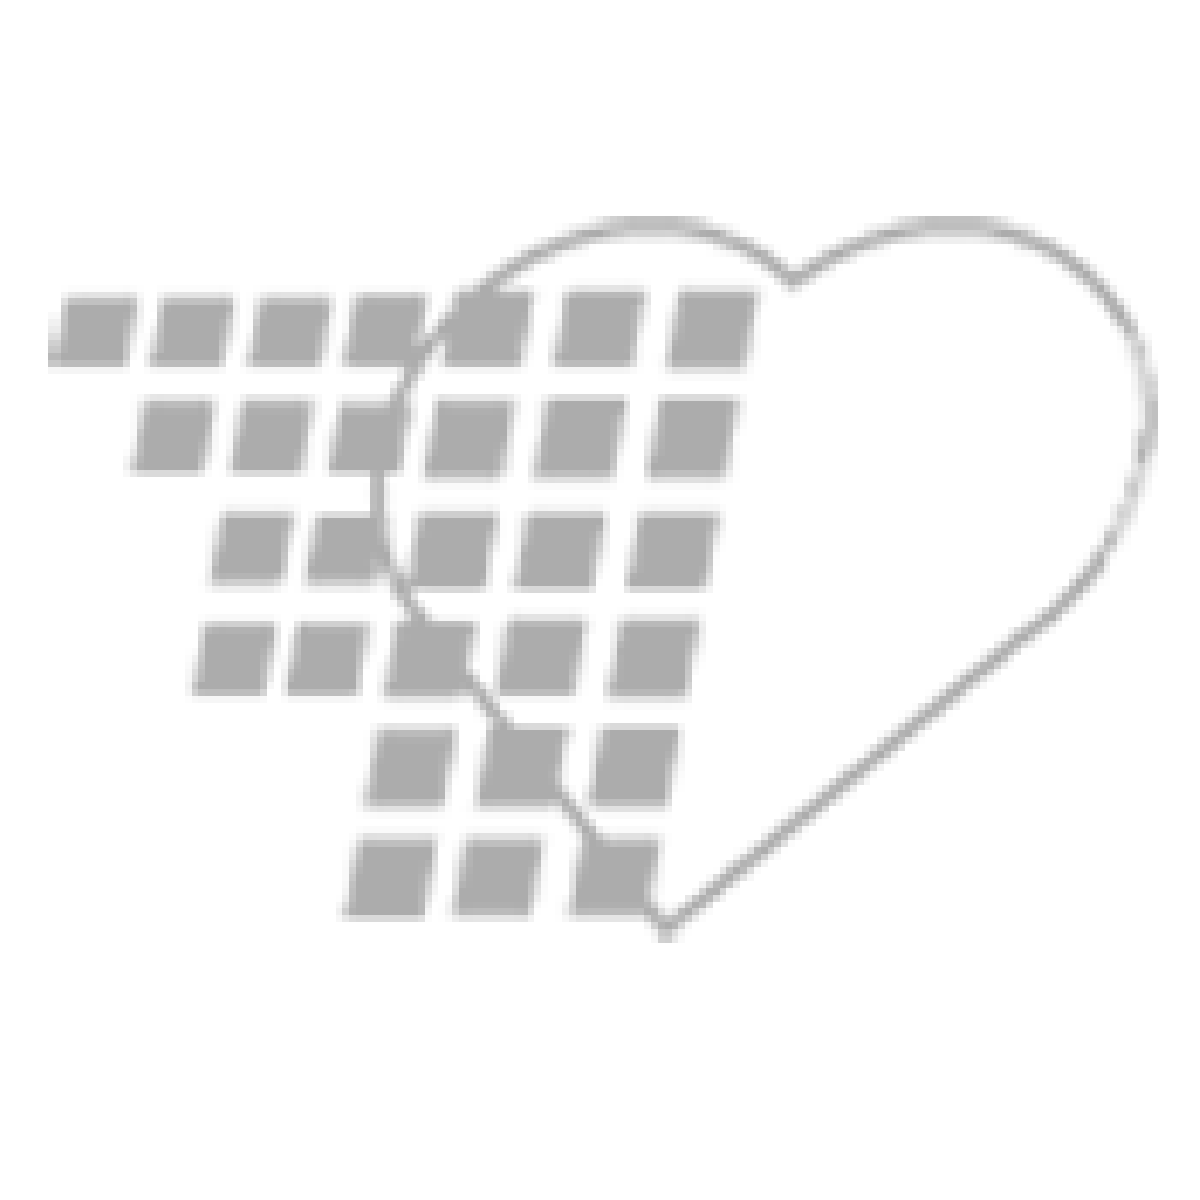 06-21-7922 BD™ Vacutainer® Plus Plastic Sterile Tube - 4 mL Draw with Lt Grey BD Hemogard™ Closure